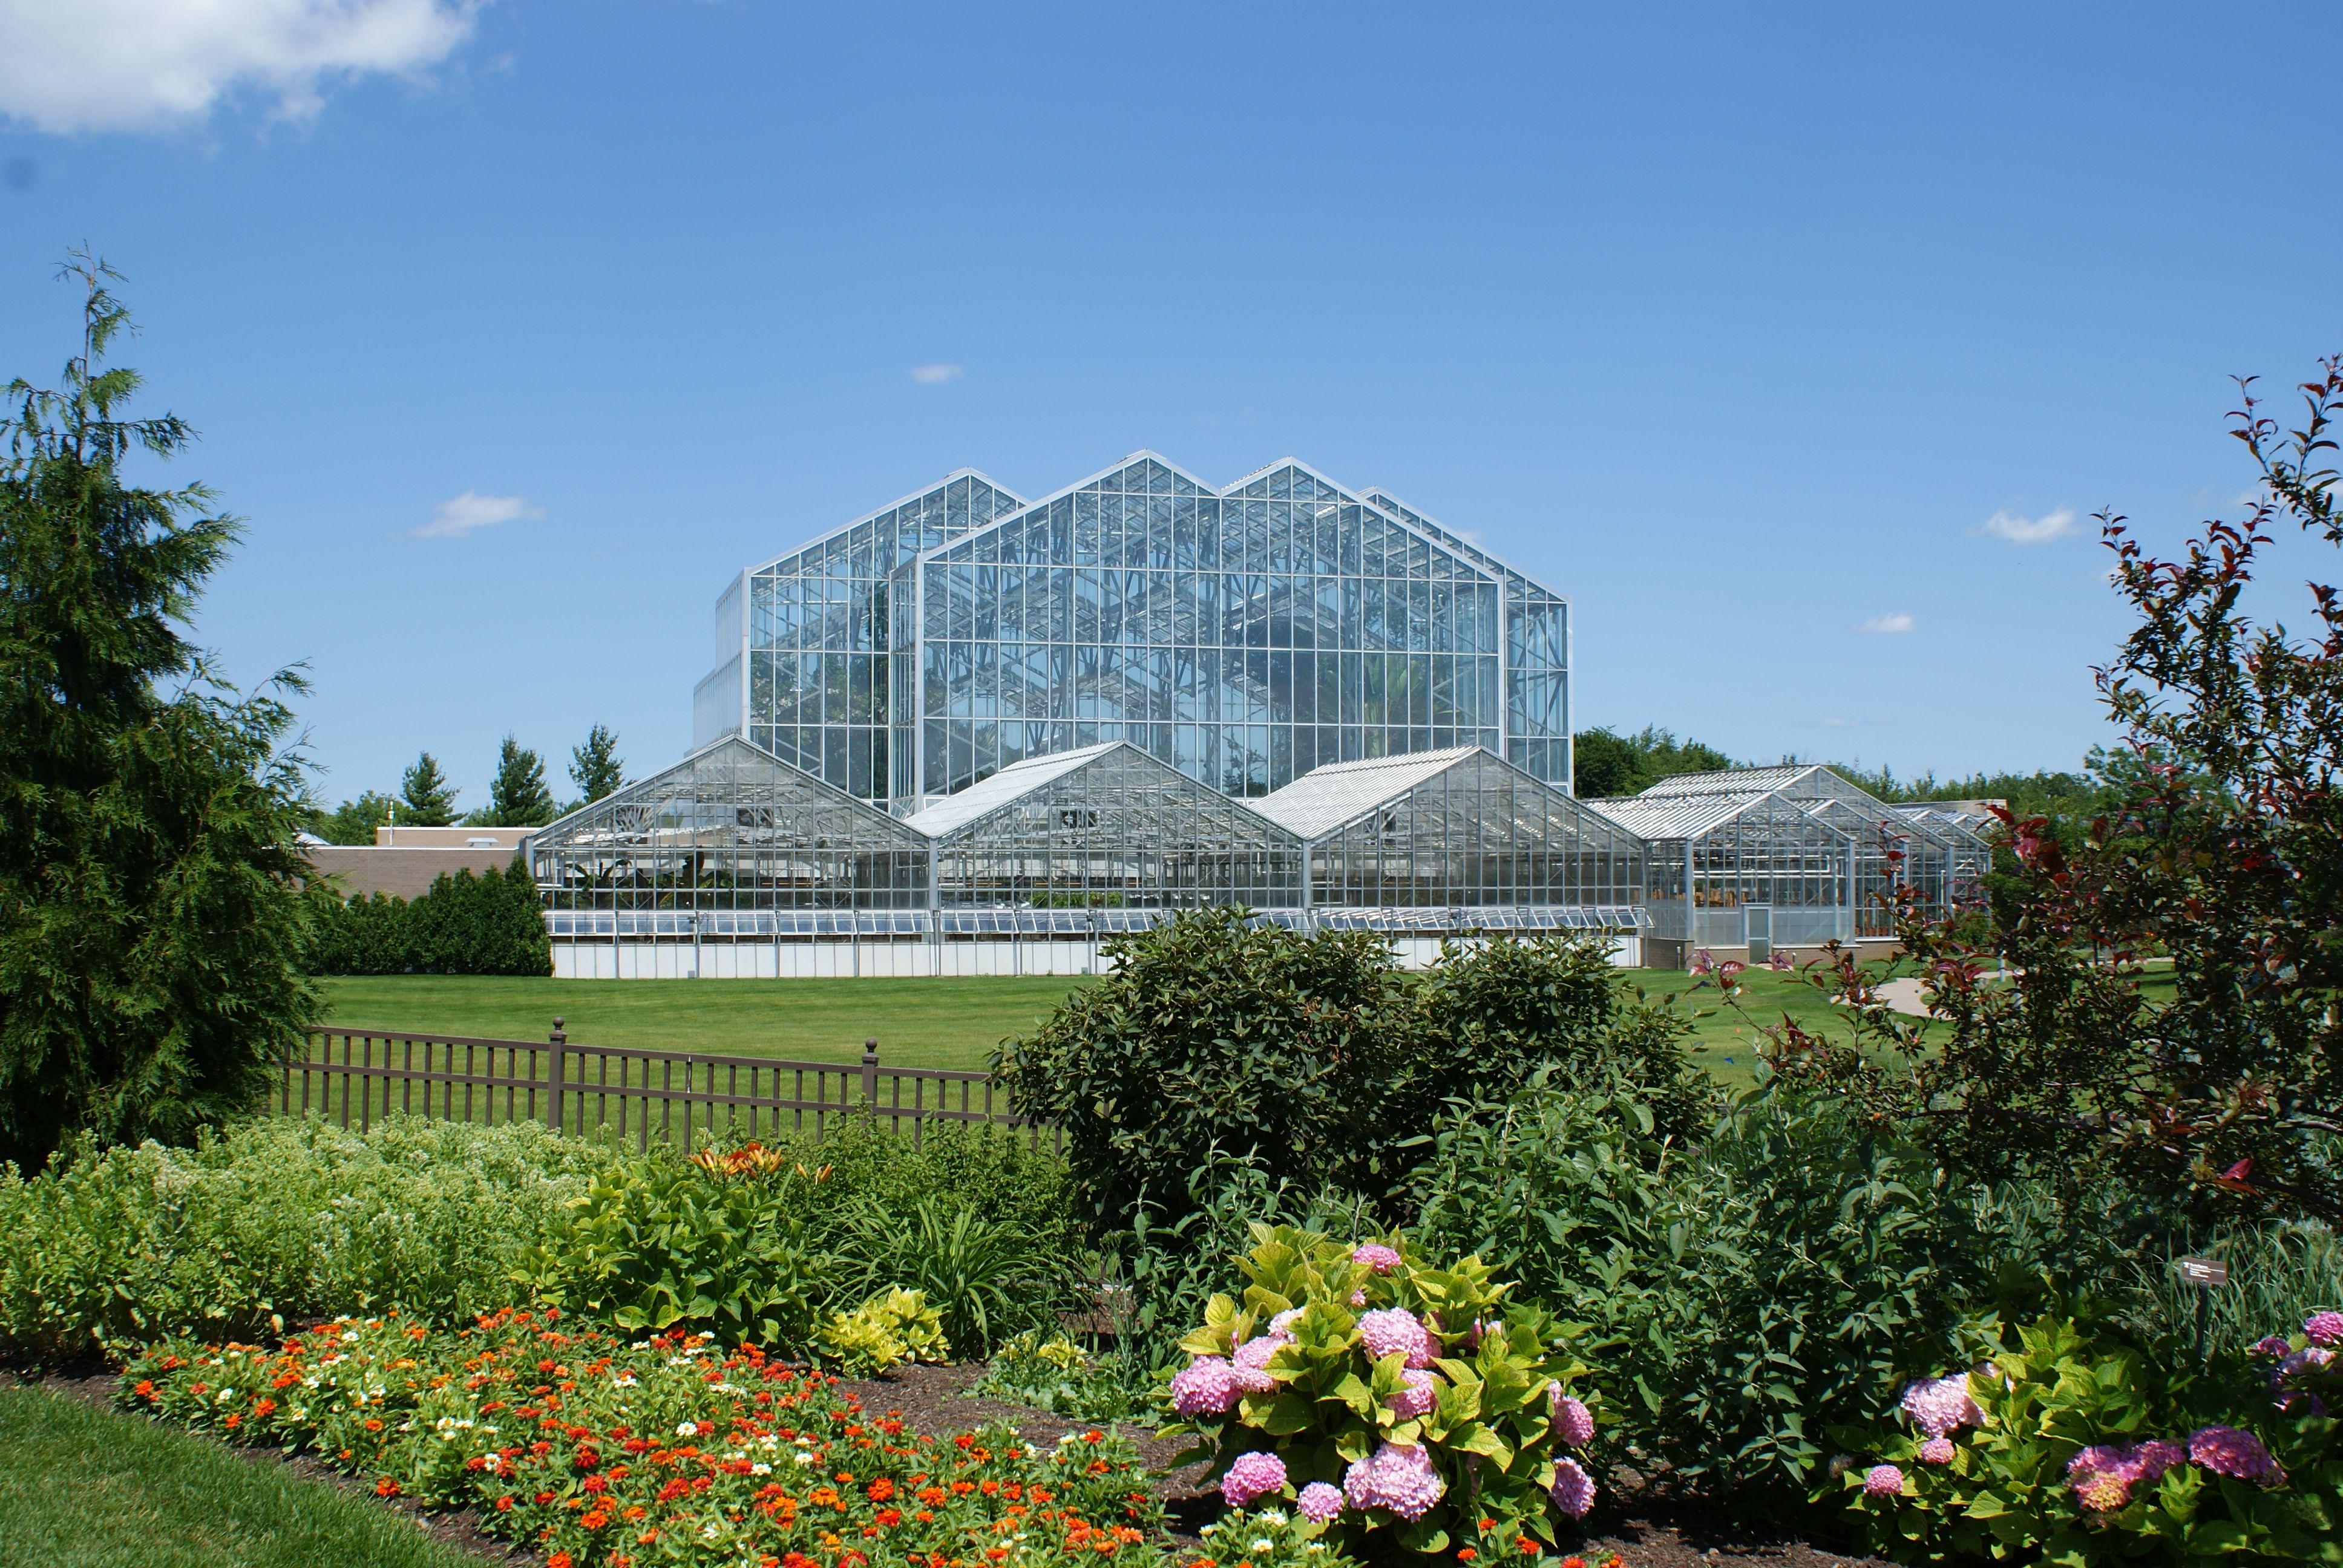 Frederik Meijer Gardens Sculpture Park Grand Rapids Mi